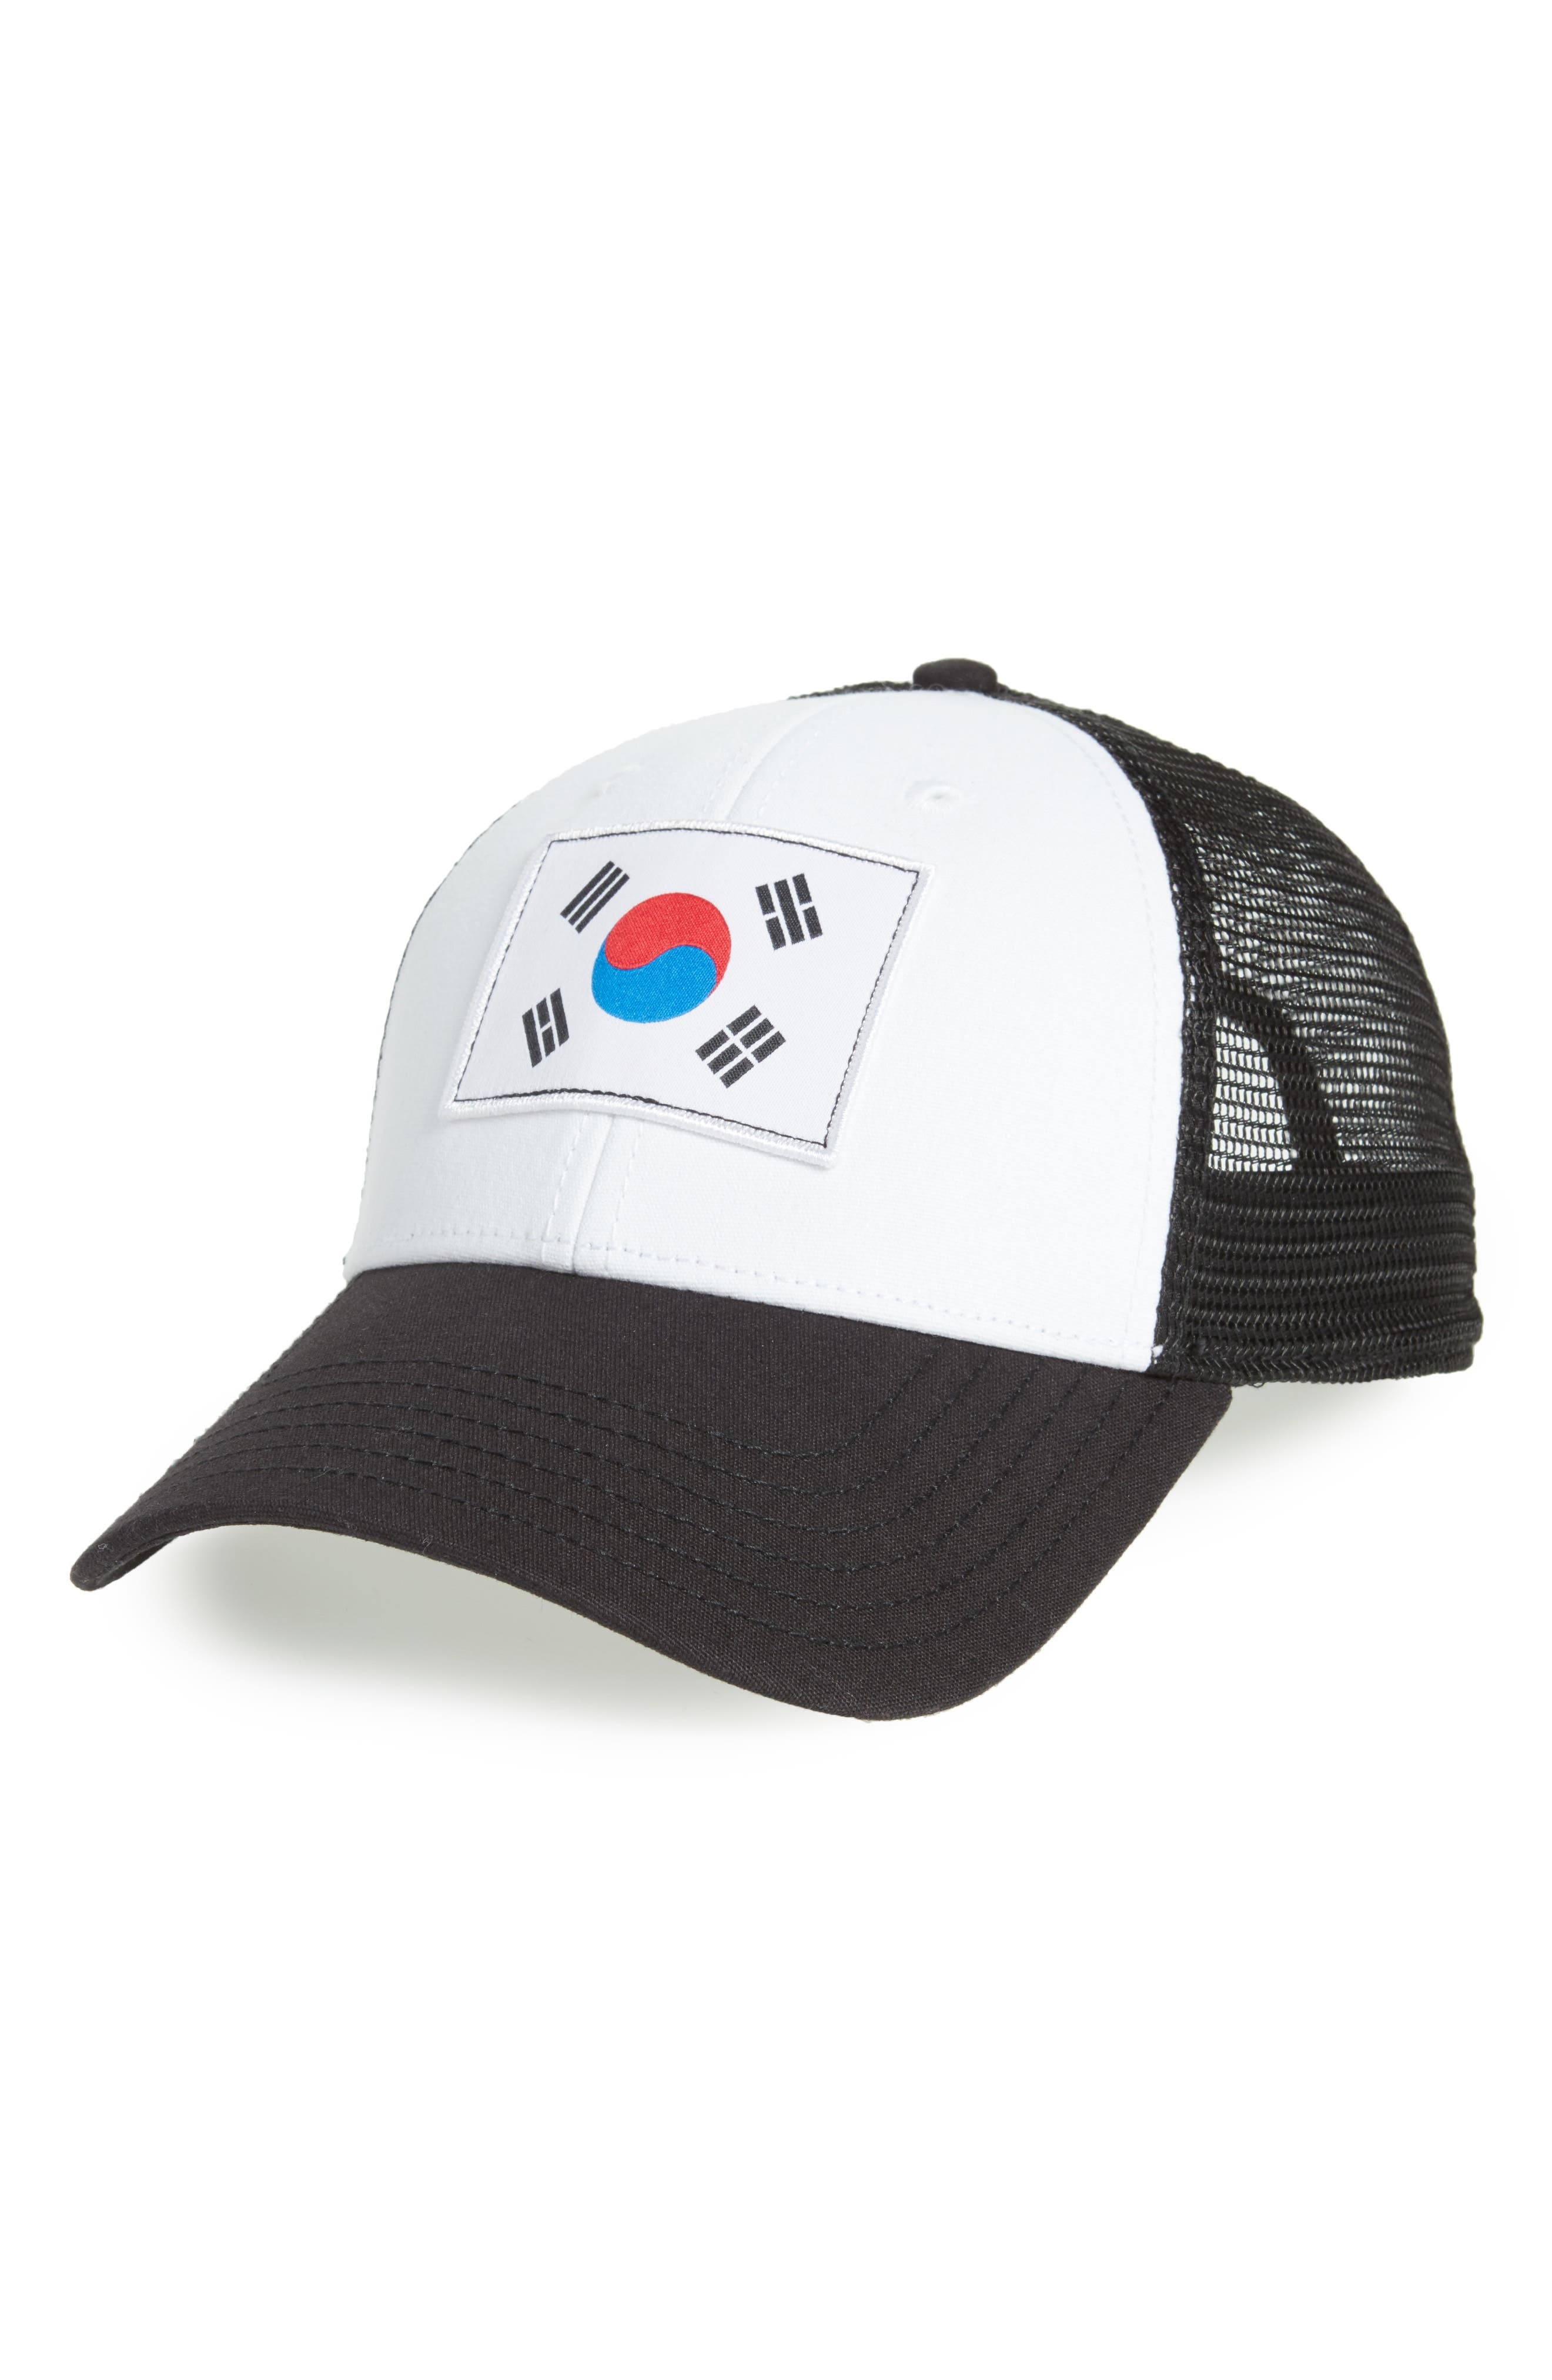 International Collection Baseball Cap,                             Main thumbnail 1, color,                             100